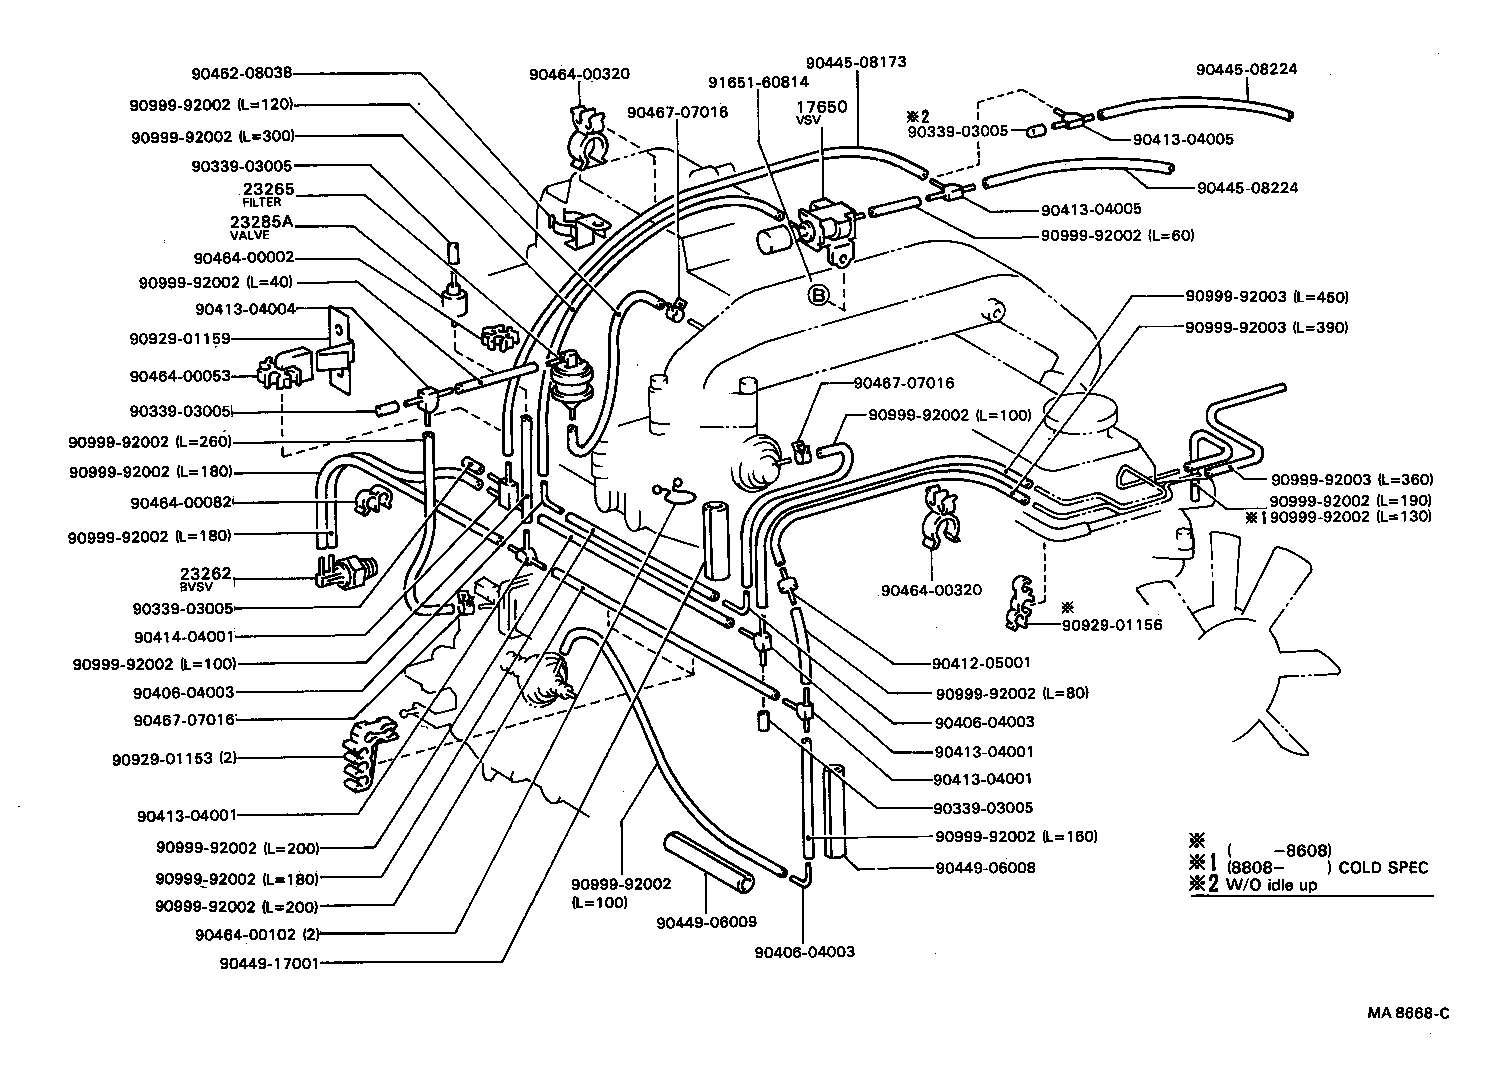 toyota coasterhb31r-mrx1 - tool-engine-fuel